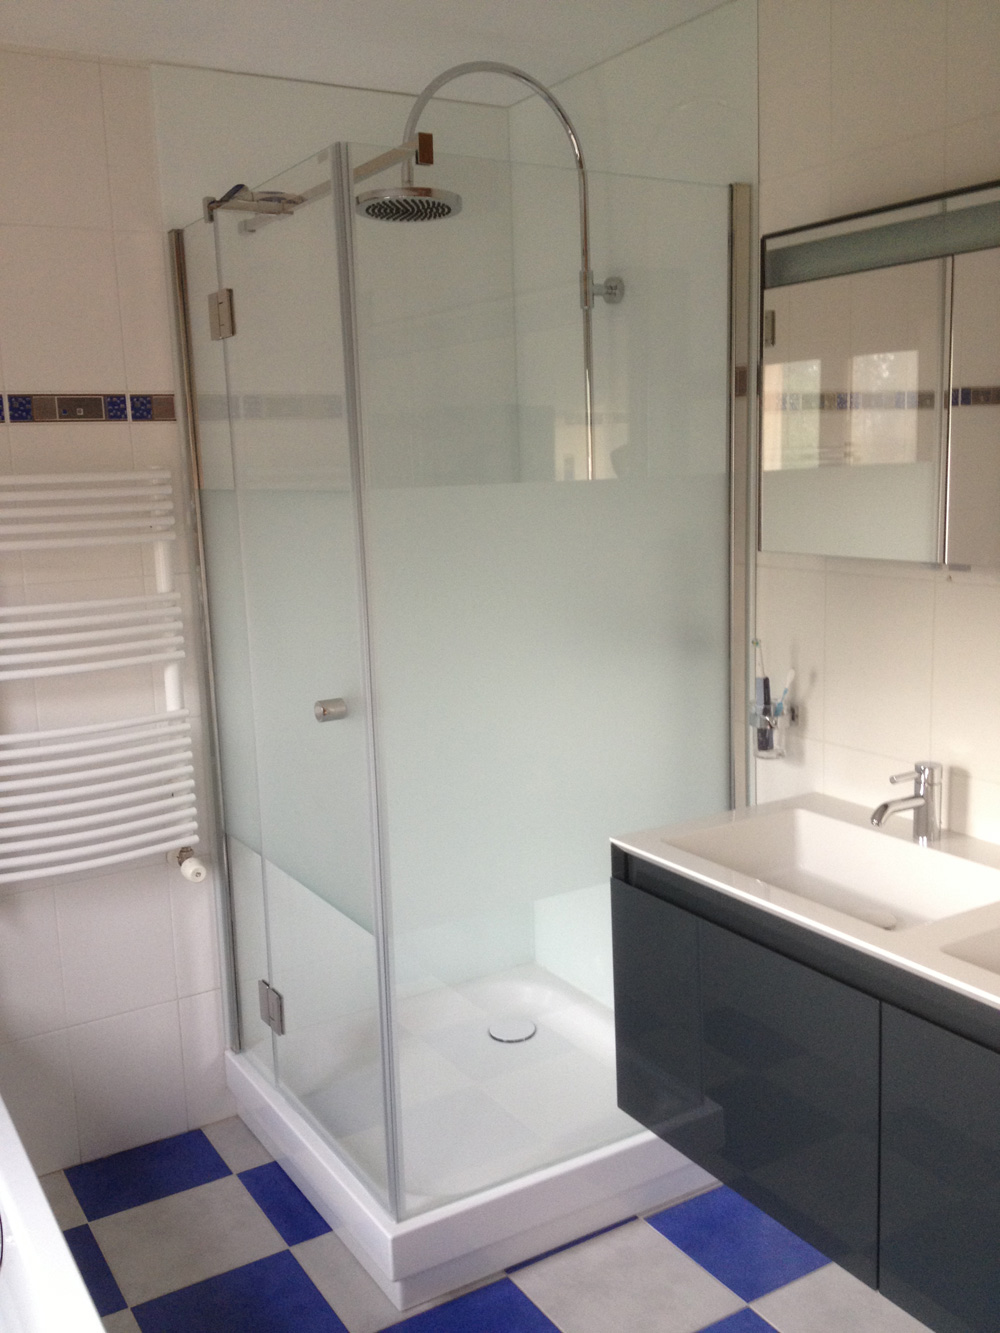 Paepens badkamer merelbeke foto s van nieuw en oud - Badkamer foto met douche ...